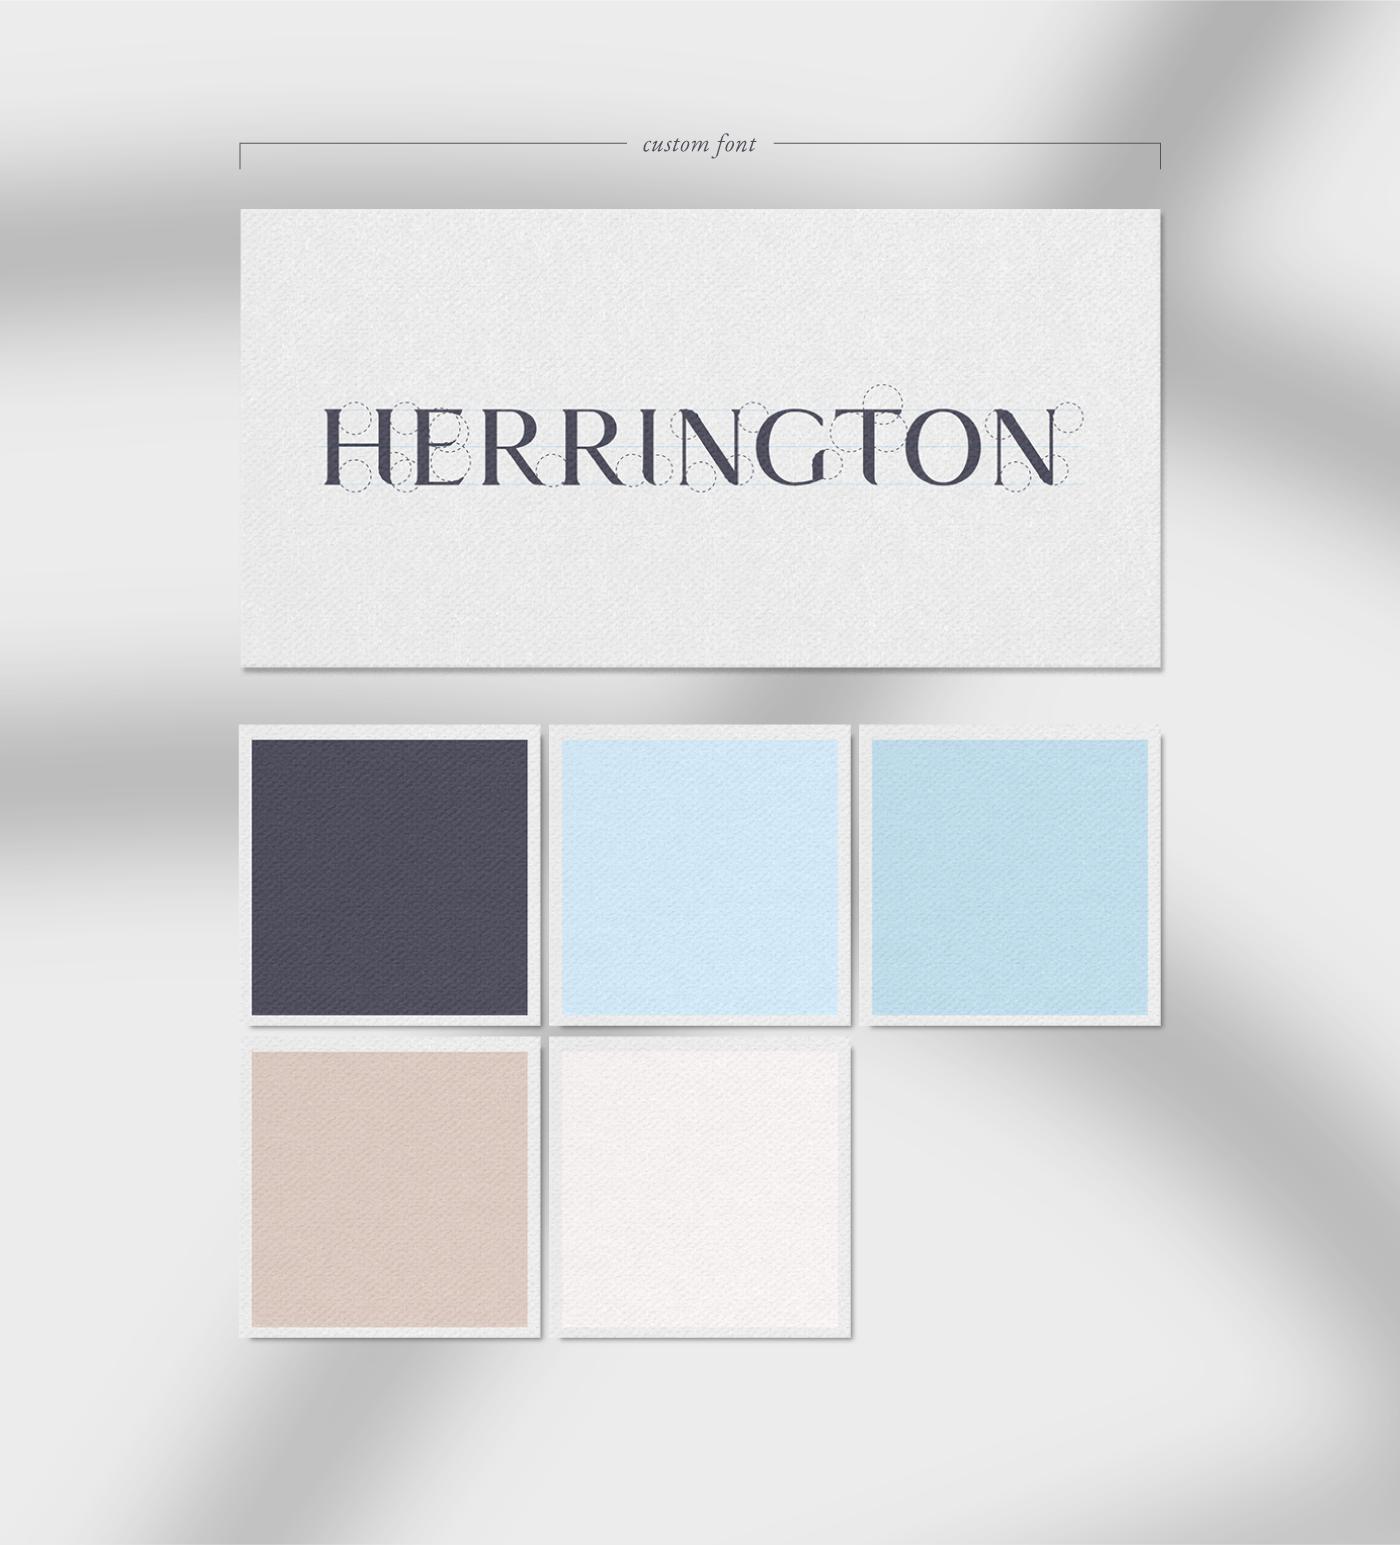 Herrington on the Bay by Wink Digital